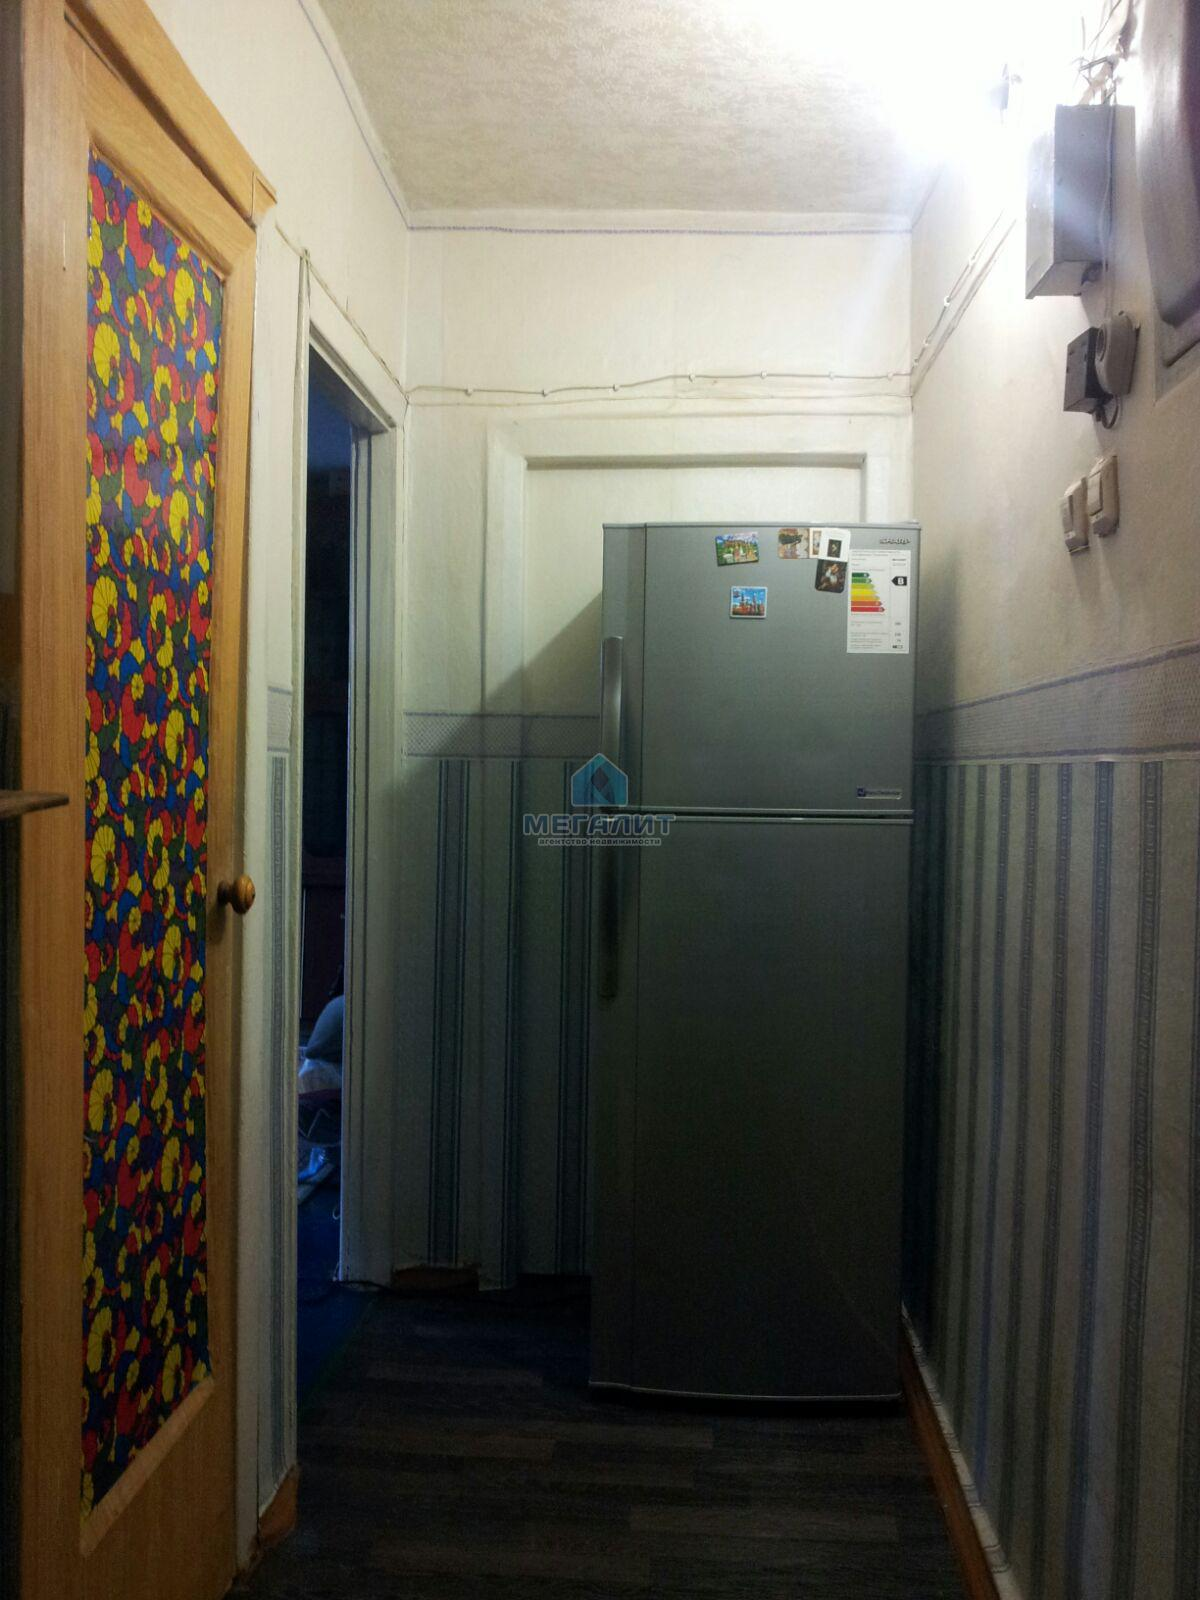 Аренда 2-к квартиры Краснооктябрьская 17, 45.0 м² (миниатюра №2)